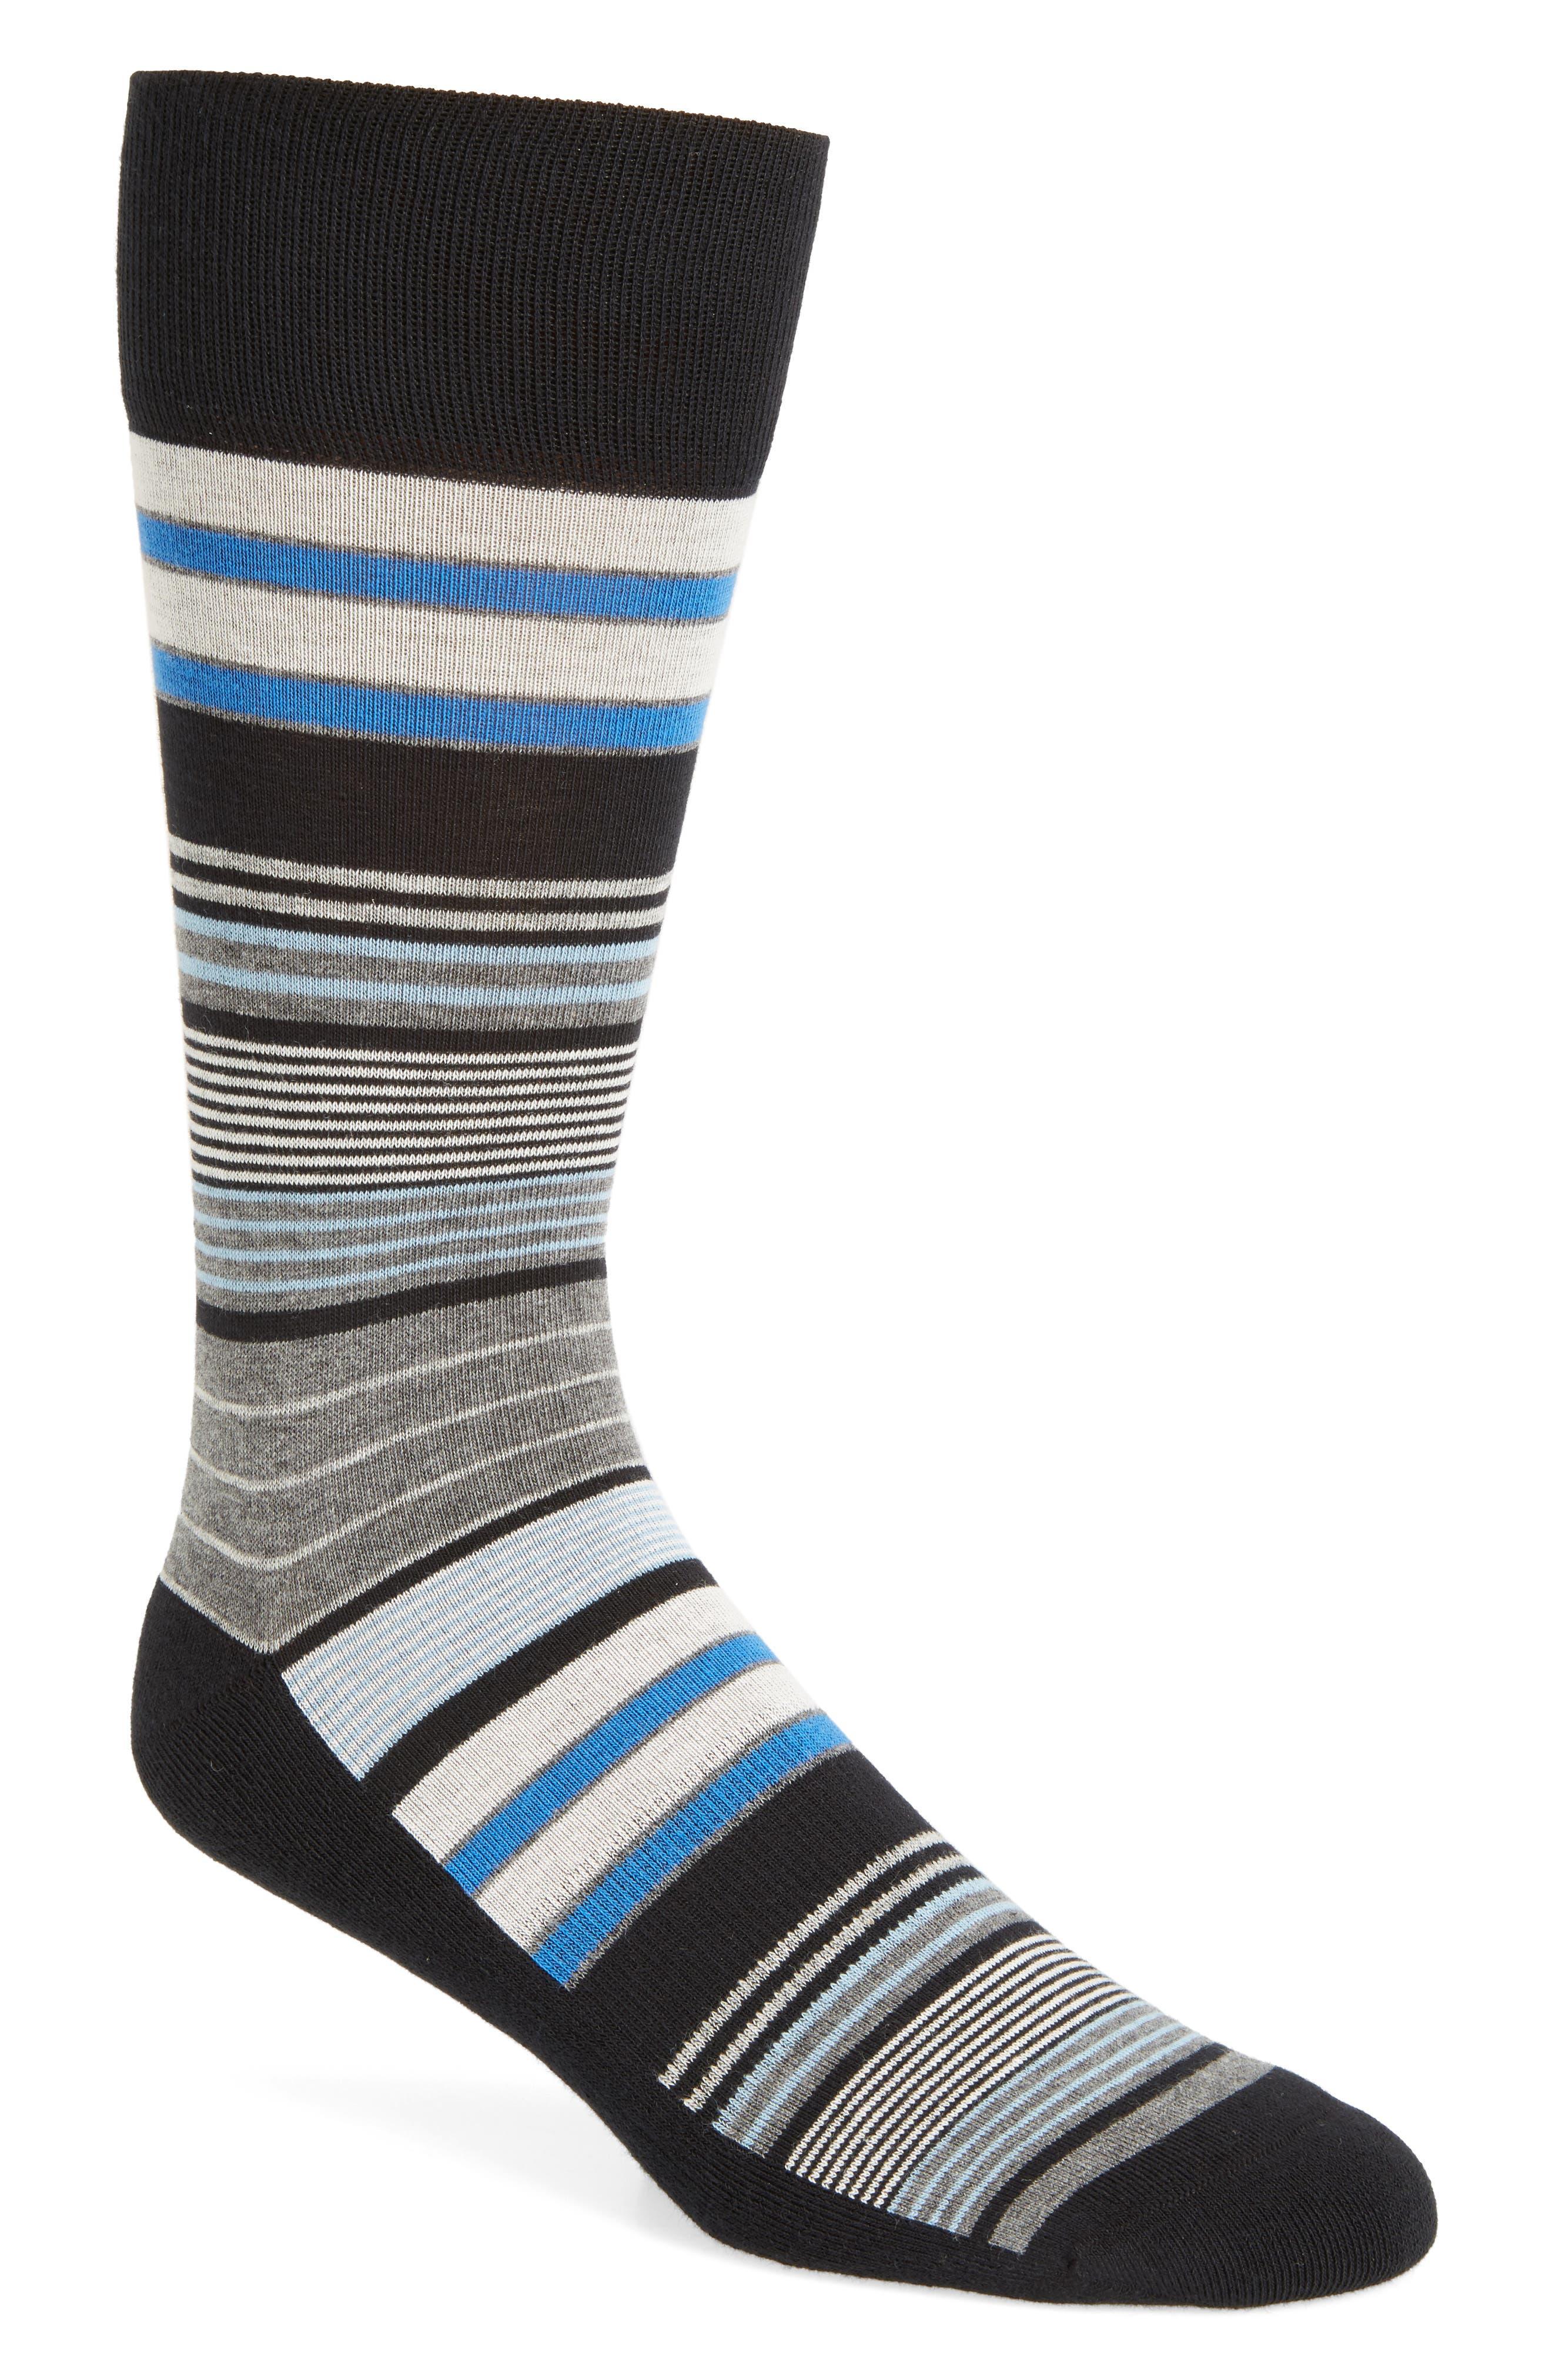 Random Stripe Socks,                             Main thumbnail 1, color,                             Black